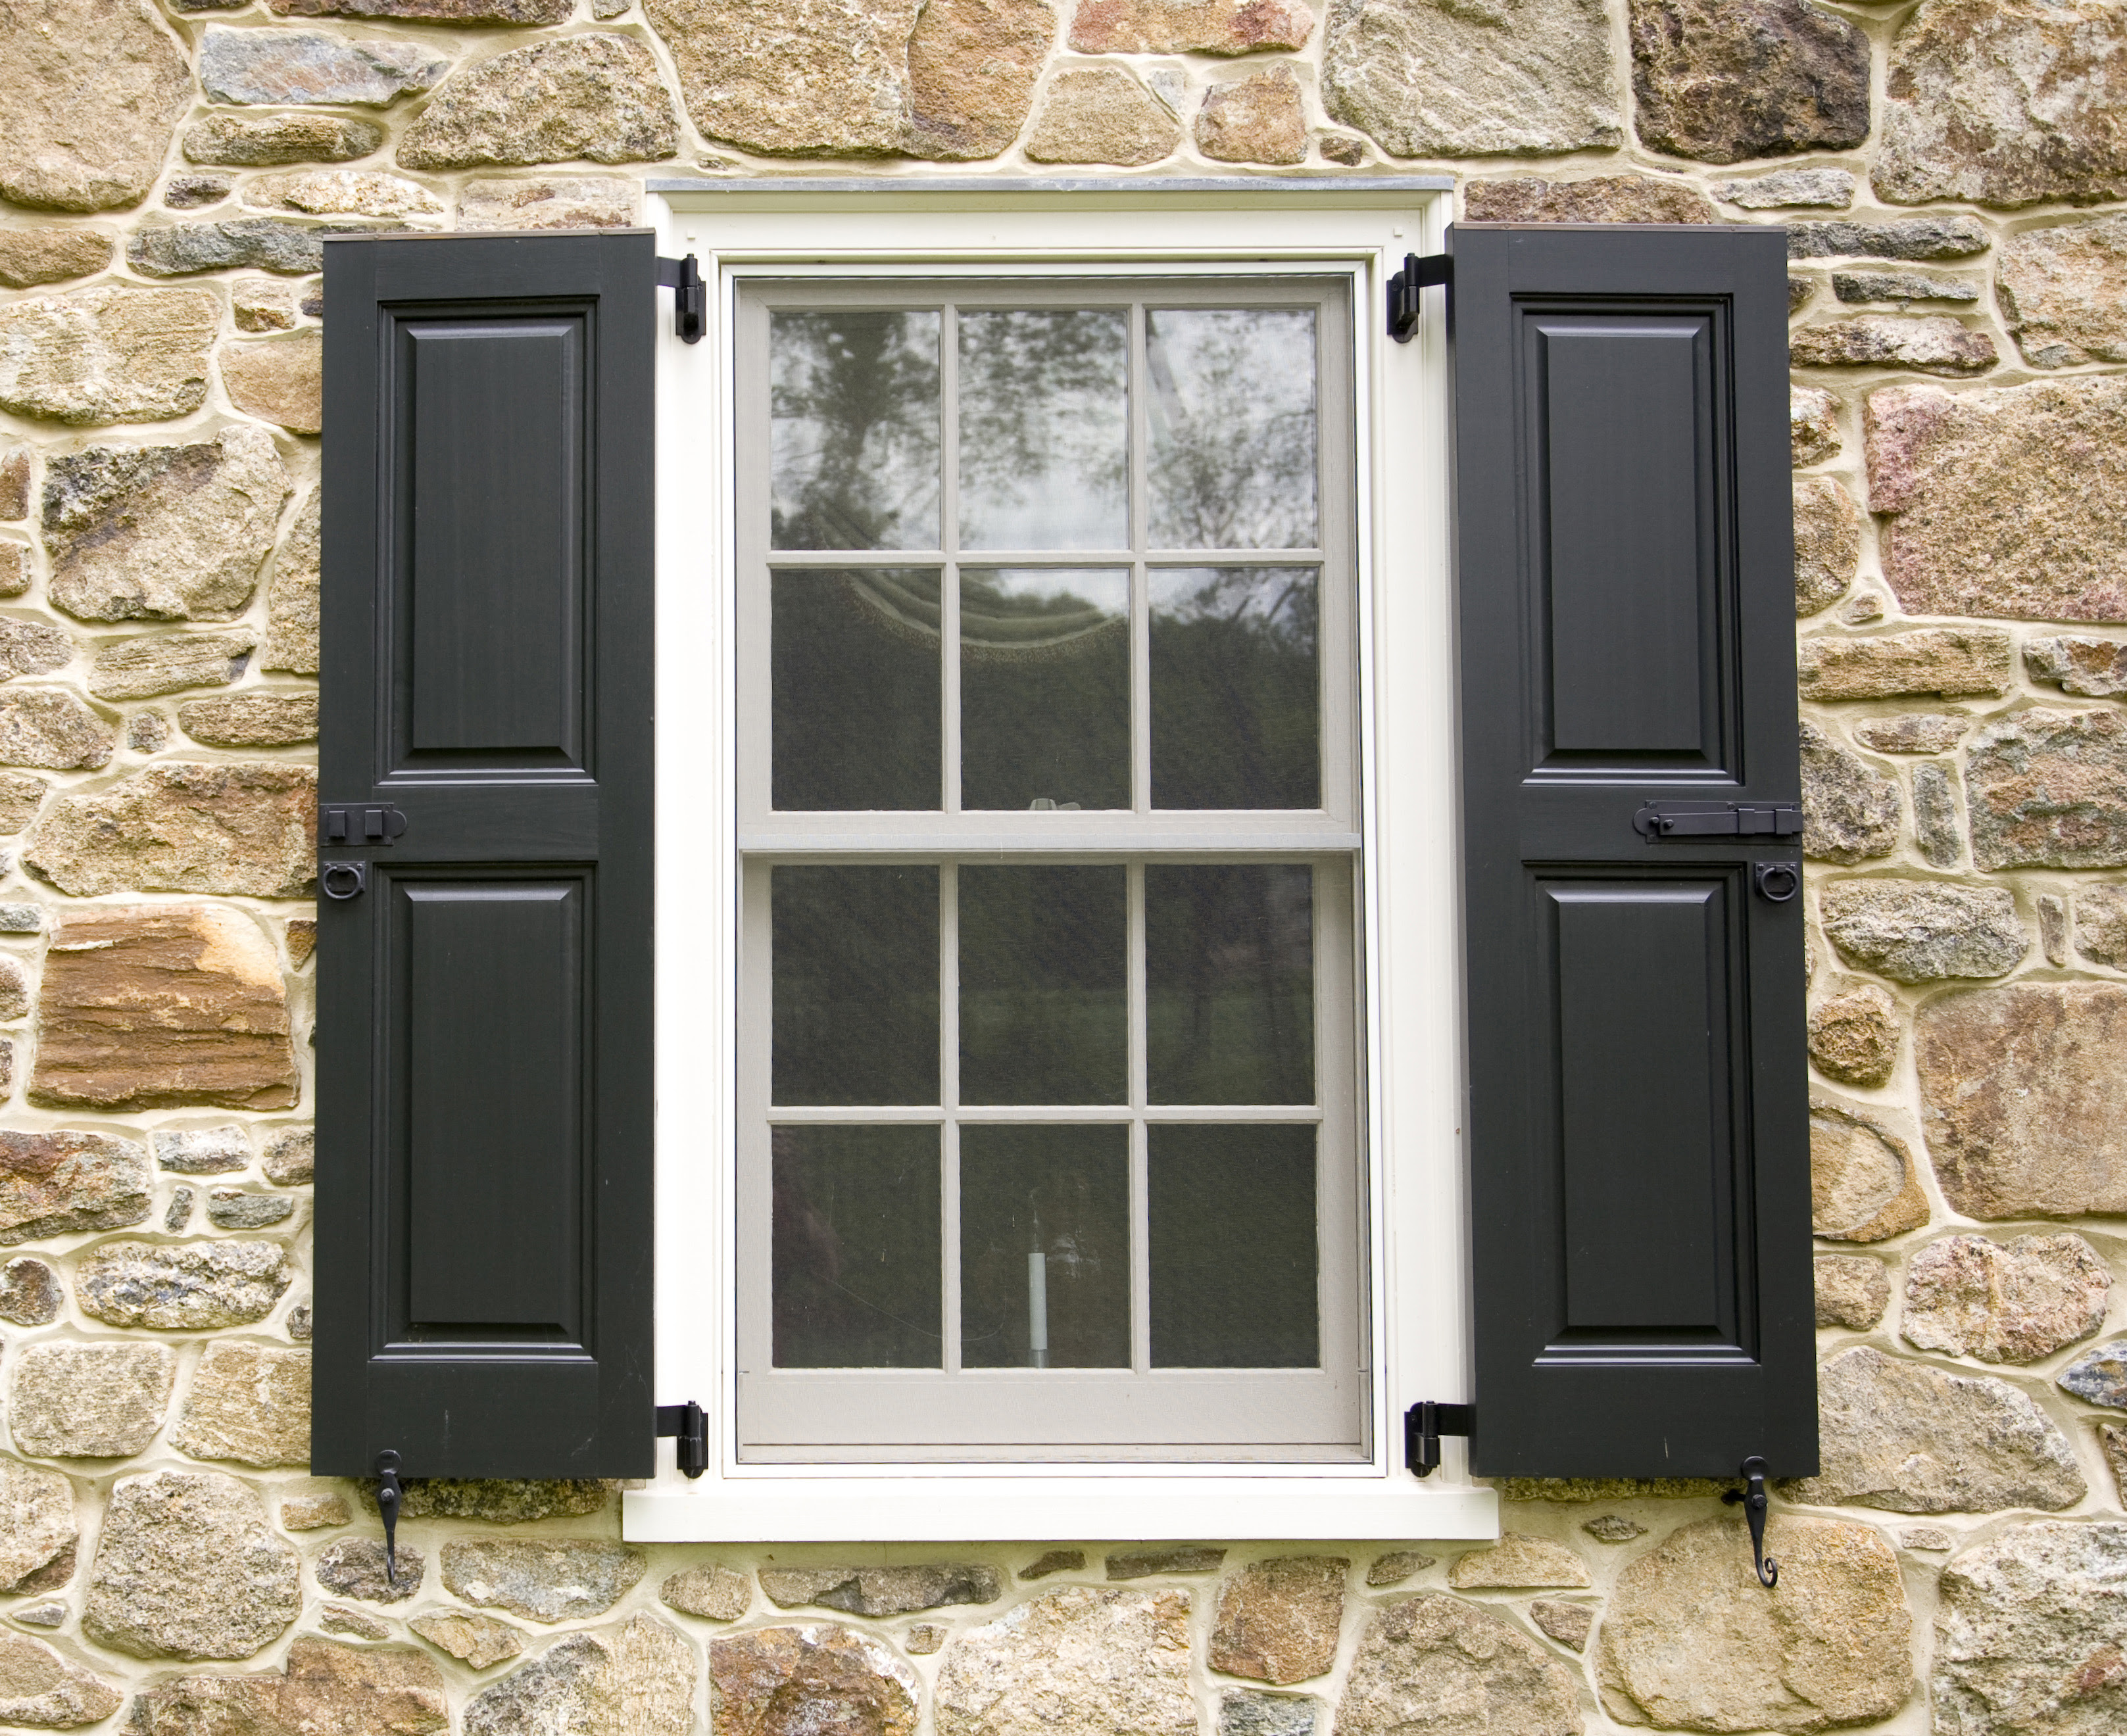 Amazing House Exterior Window Shutters 3234 x 2640 · 2688 kB · jpeg